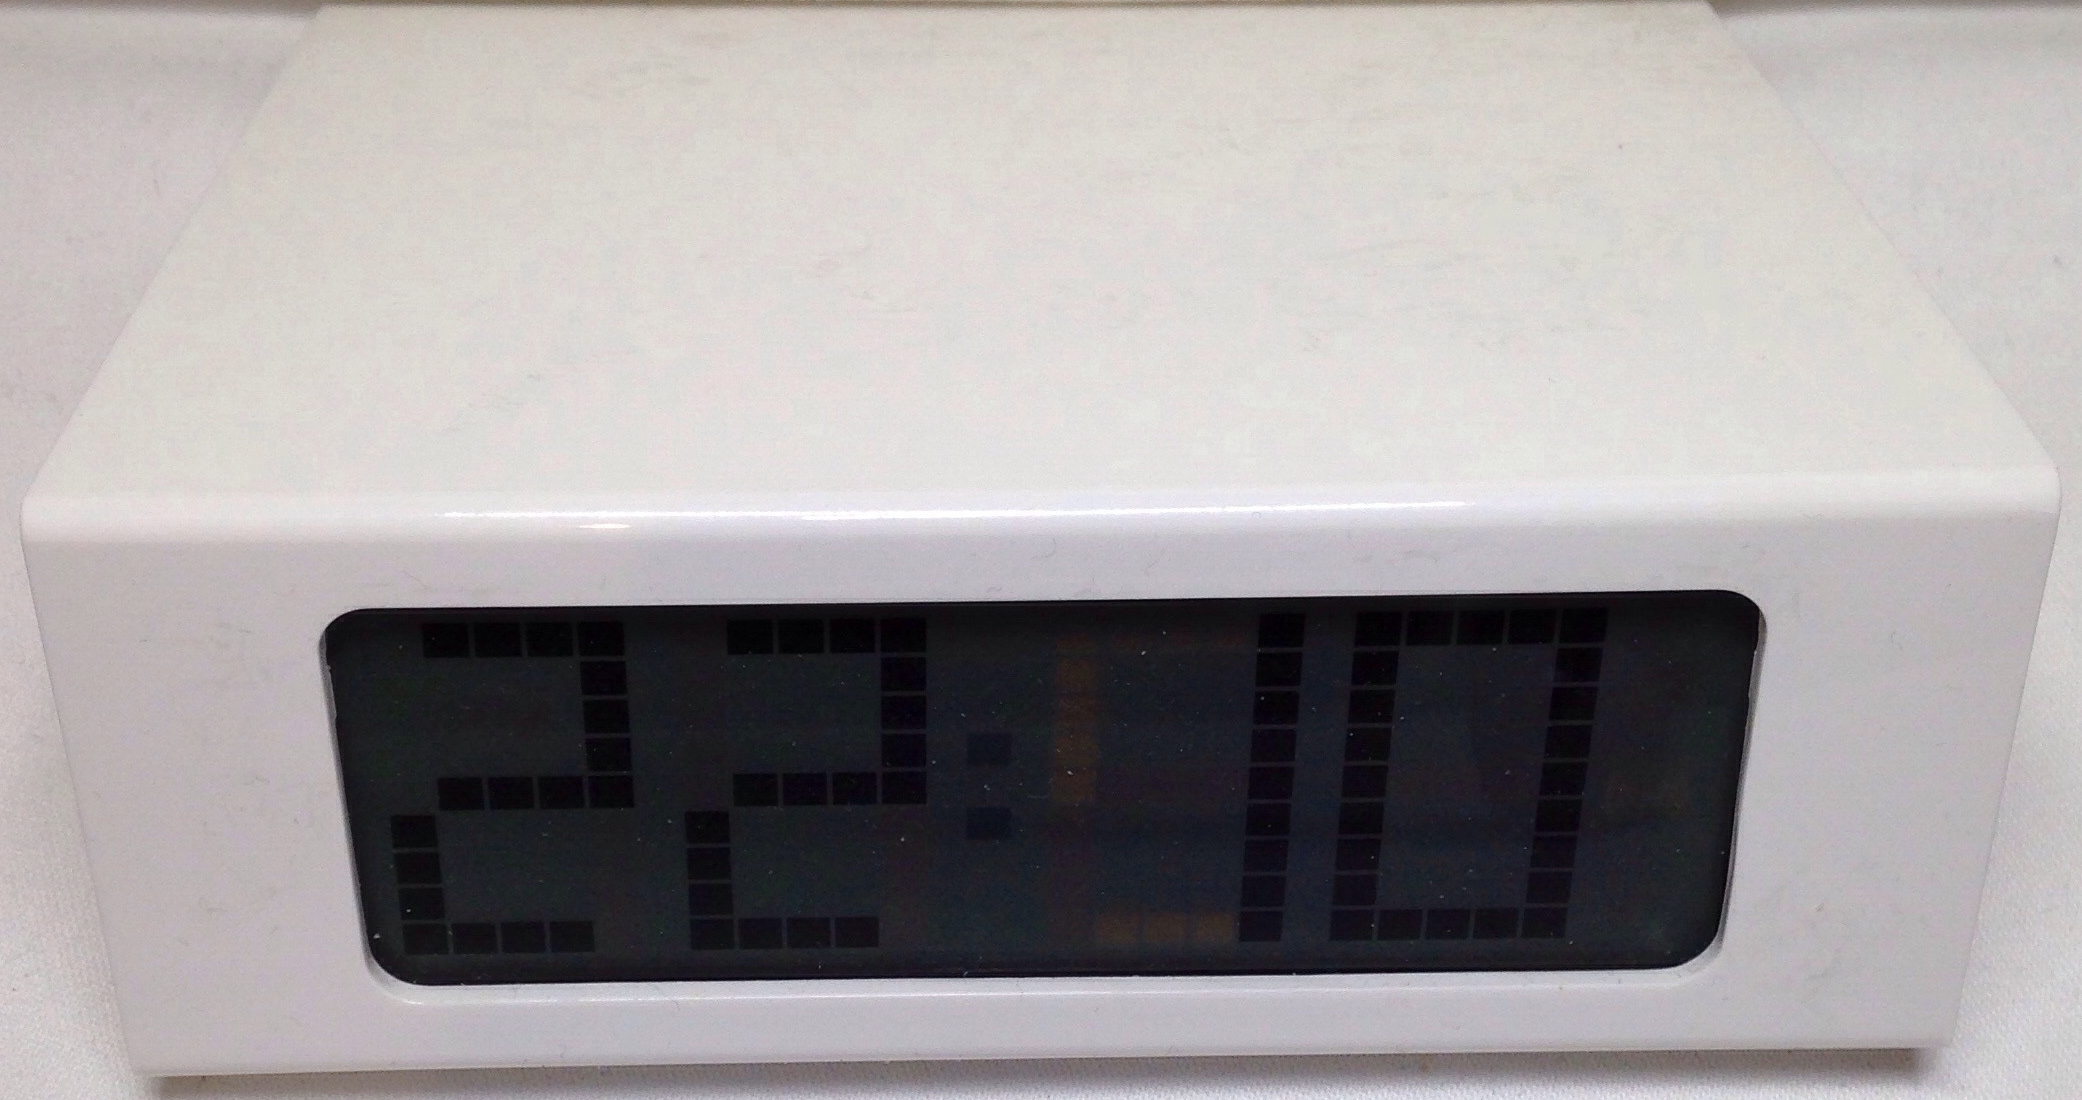 daylight saving begins and the ikea vikis digital clock the old rh garydlum wordpress com Instruction Manual ikea vikis alarm clock instructions